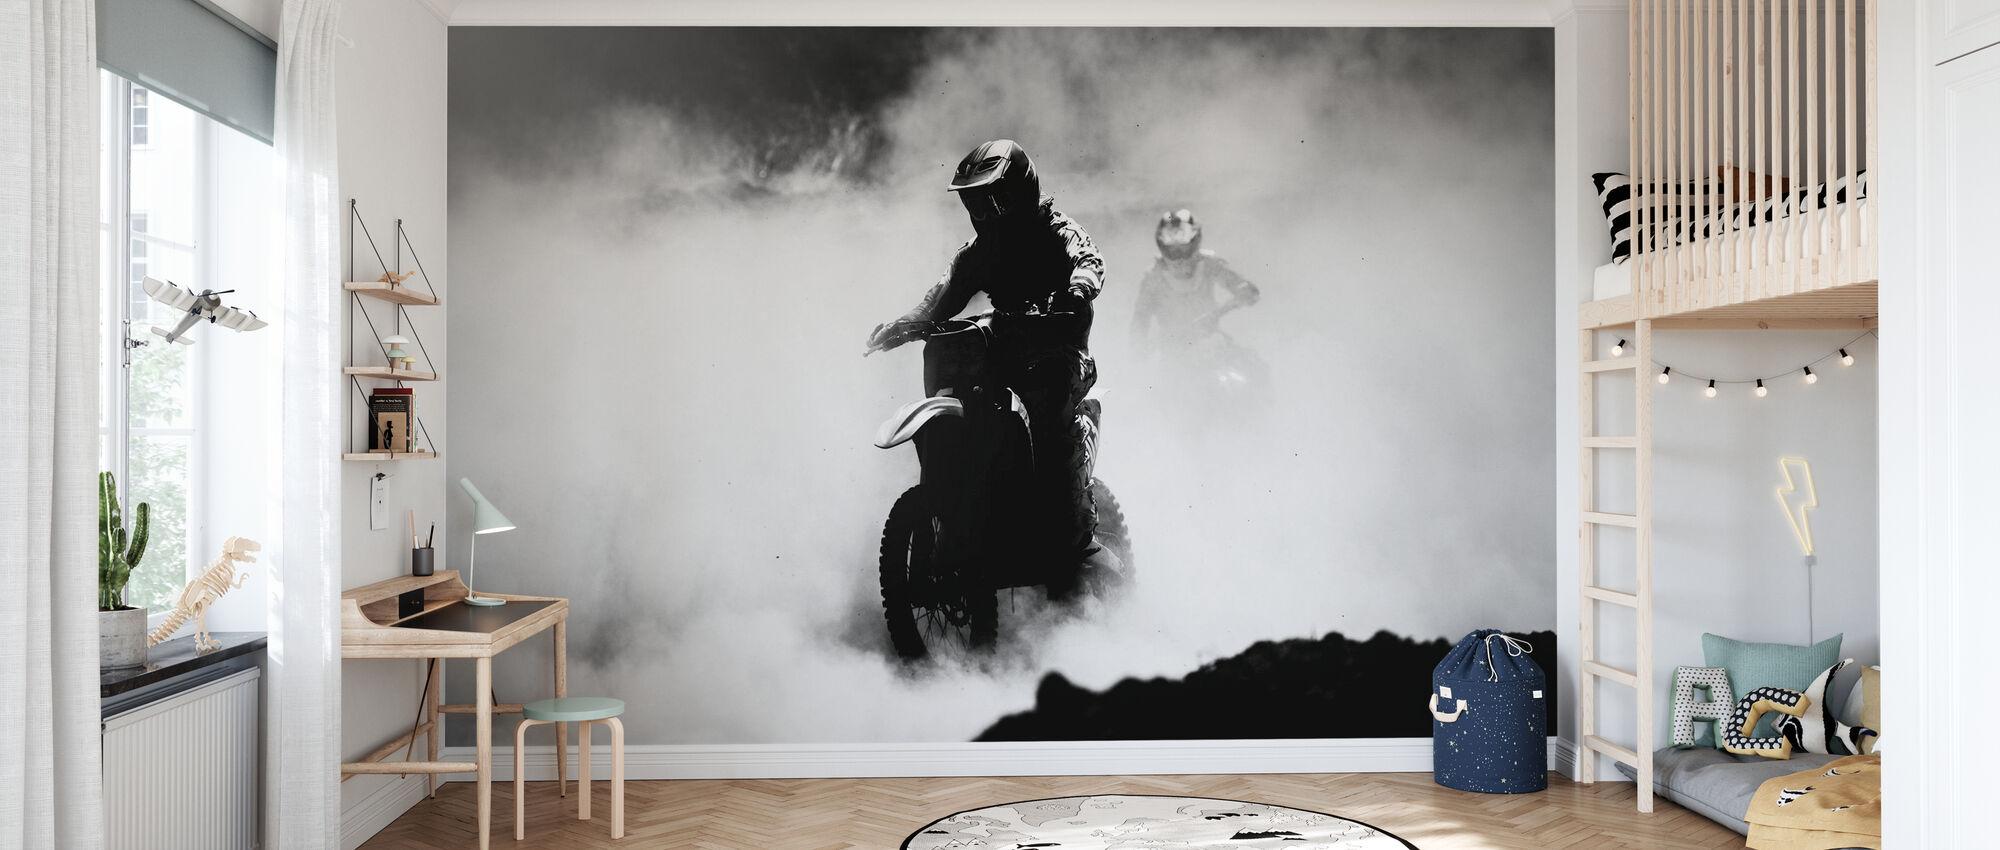 Motocross Racer - Tapetti - Lastenhuone